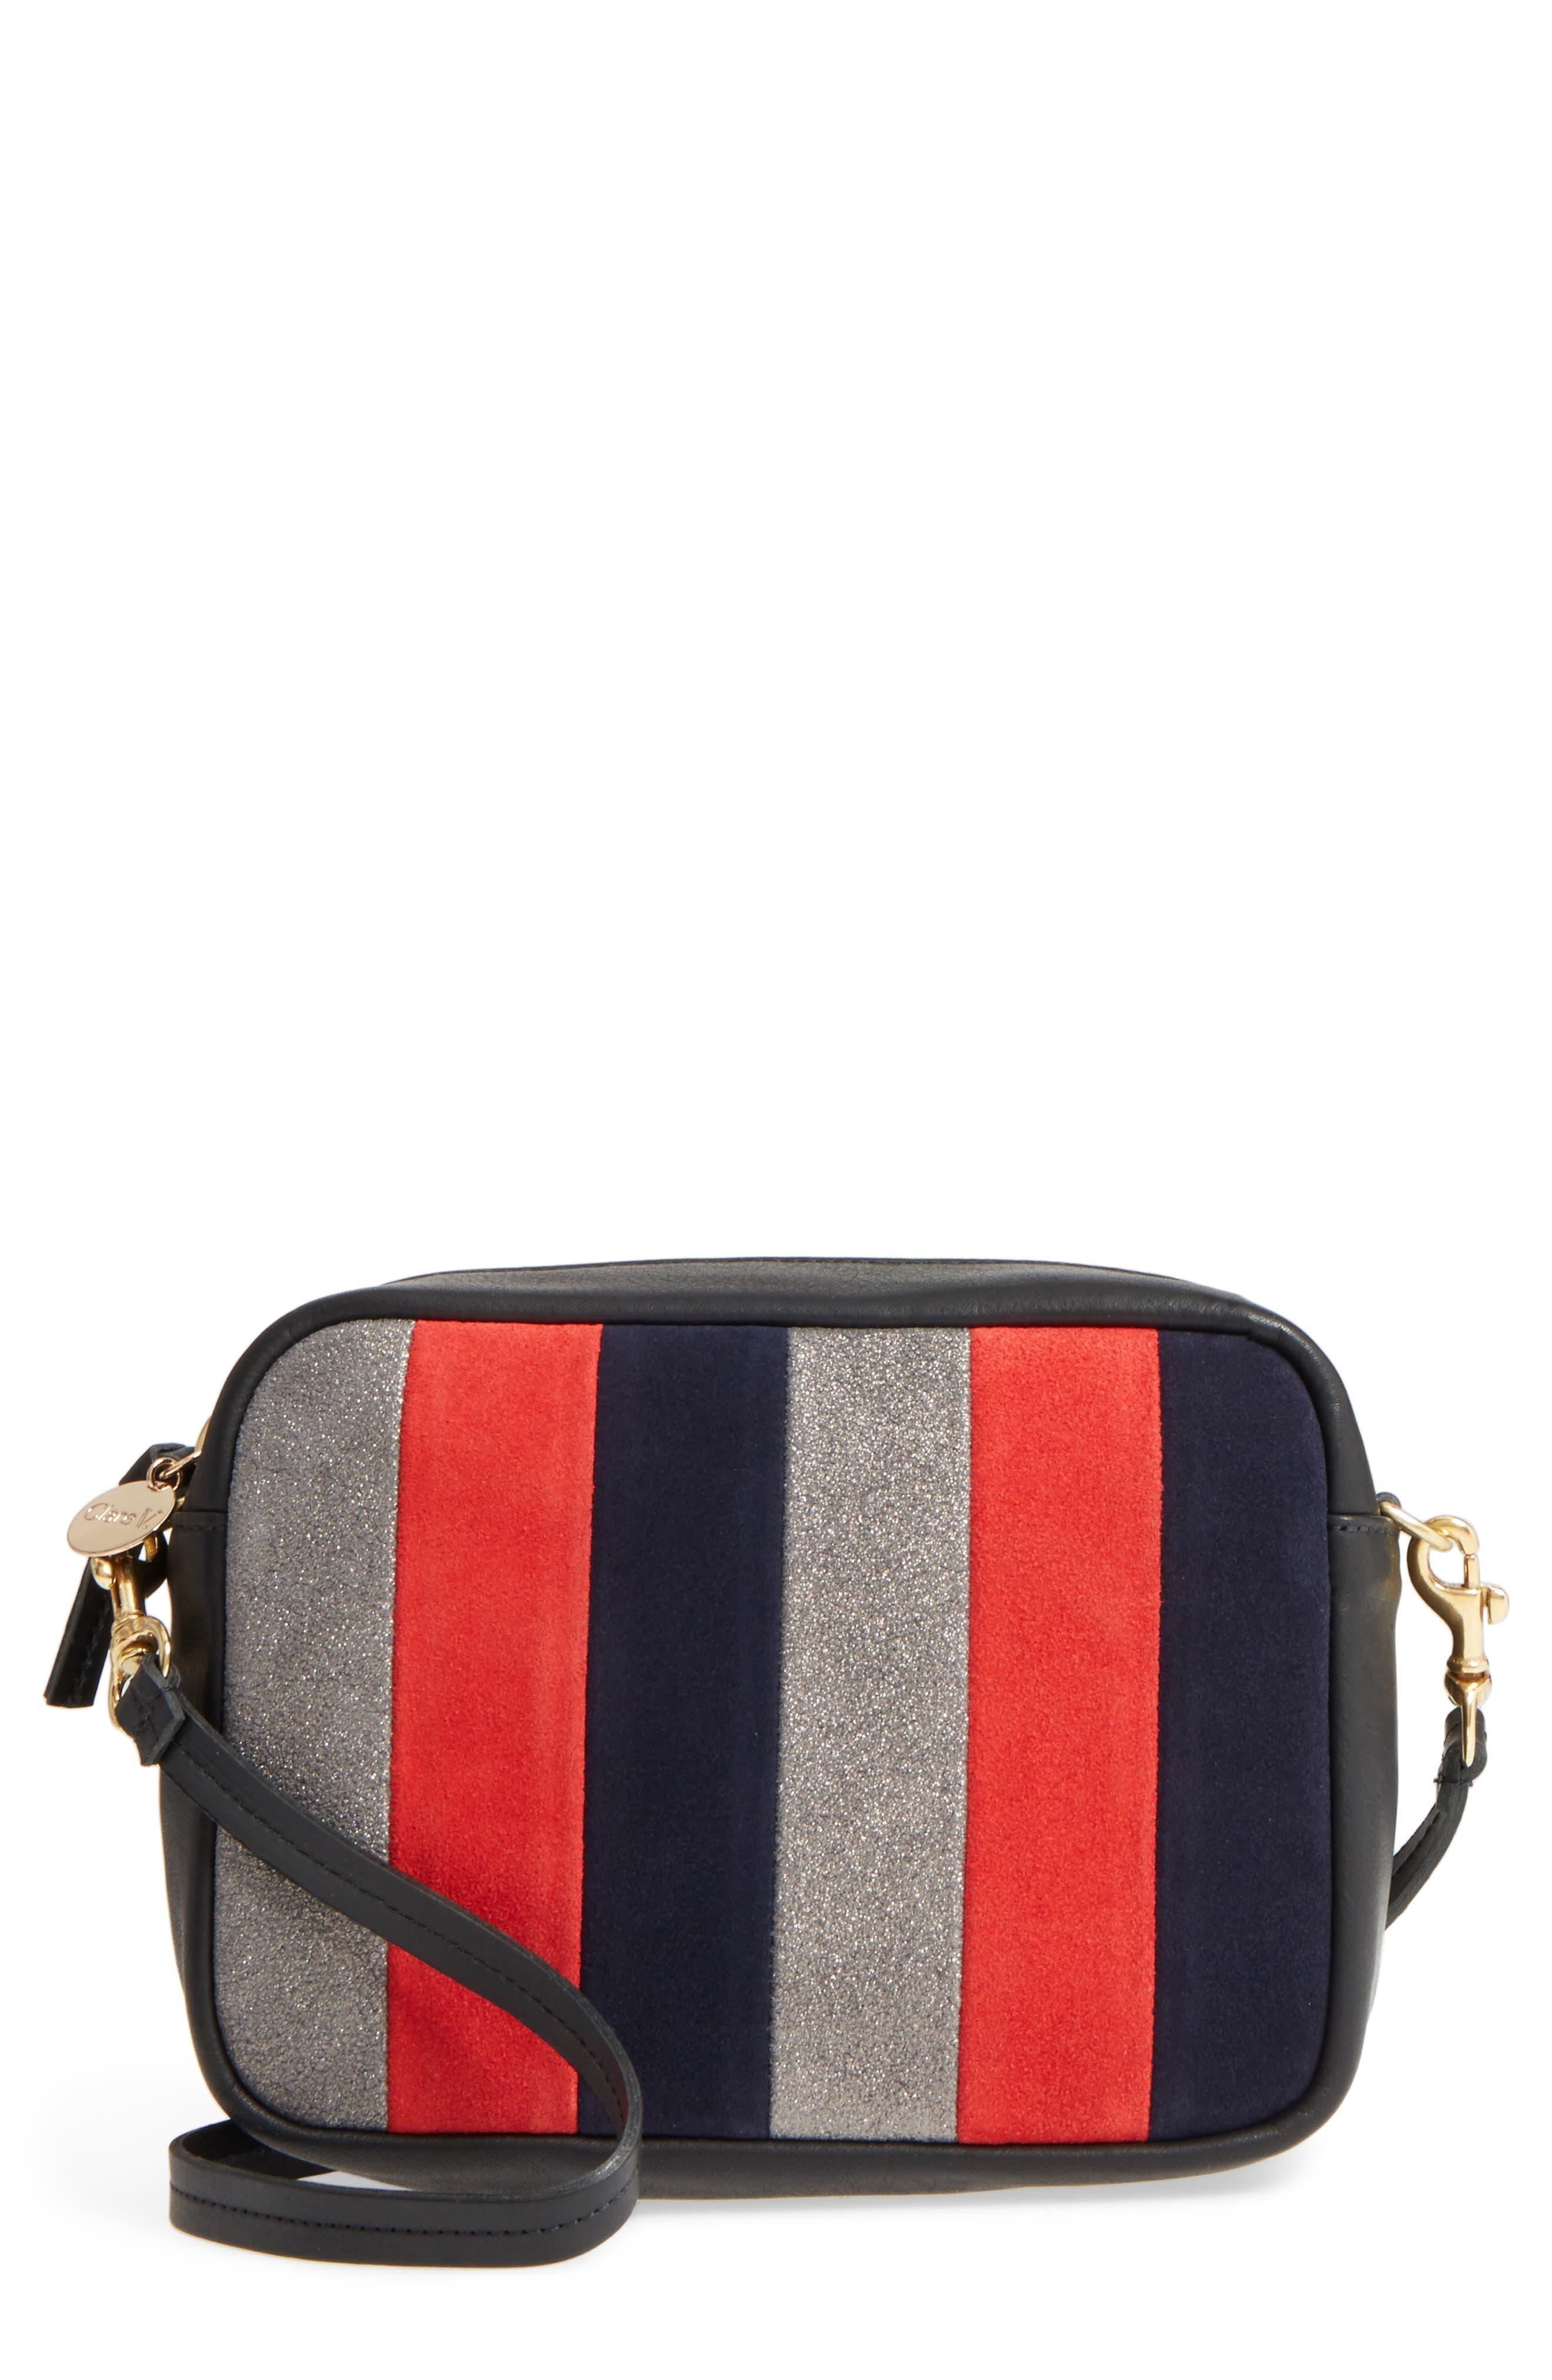 Midi Sac Stripe Leather Crossbody Bag,                             Main thumbnail 1, color,                             610